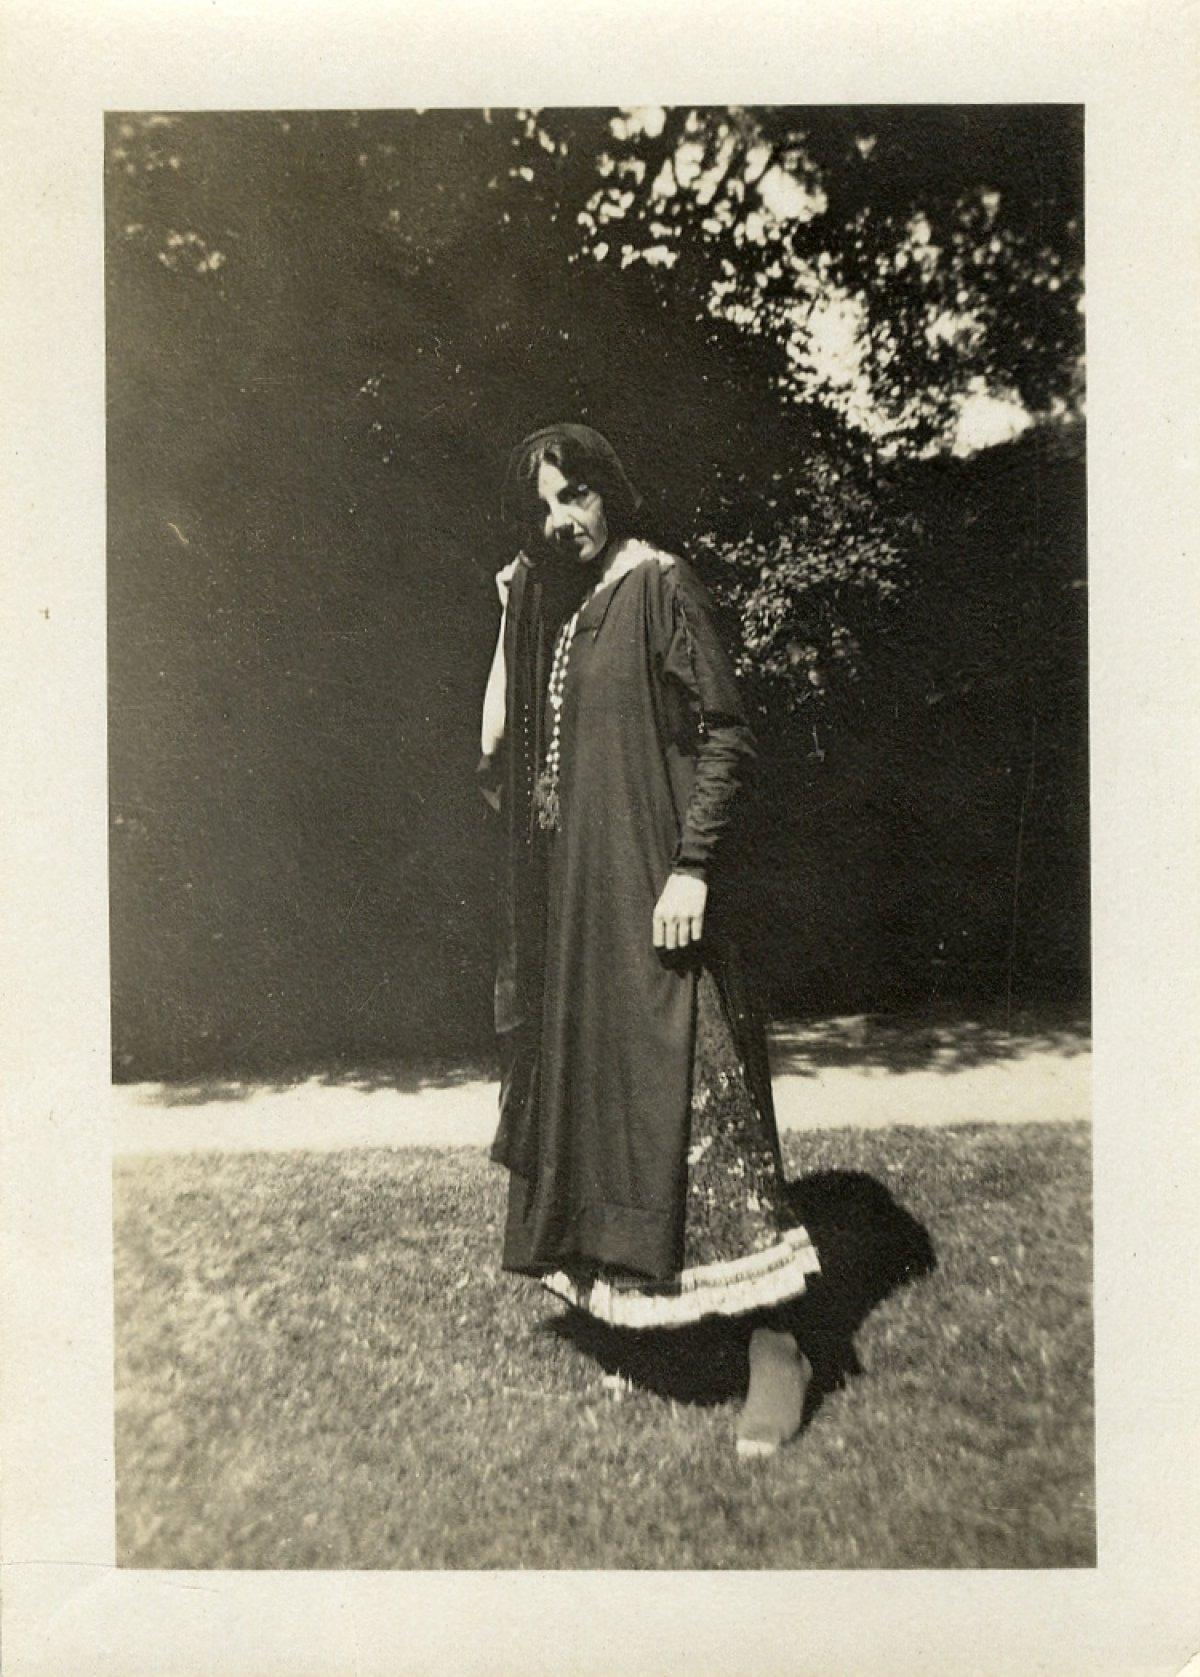 Ethel Pye as Lechery in Doctor Faustus. [RCB/Ph/59]